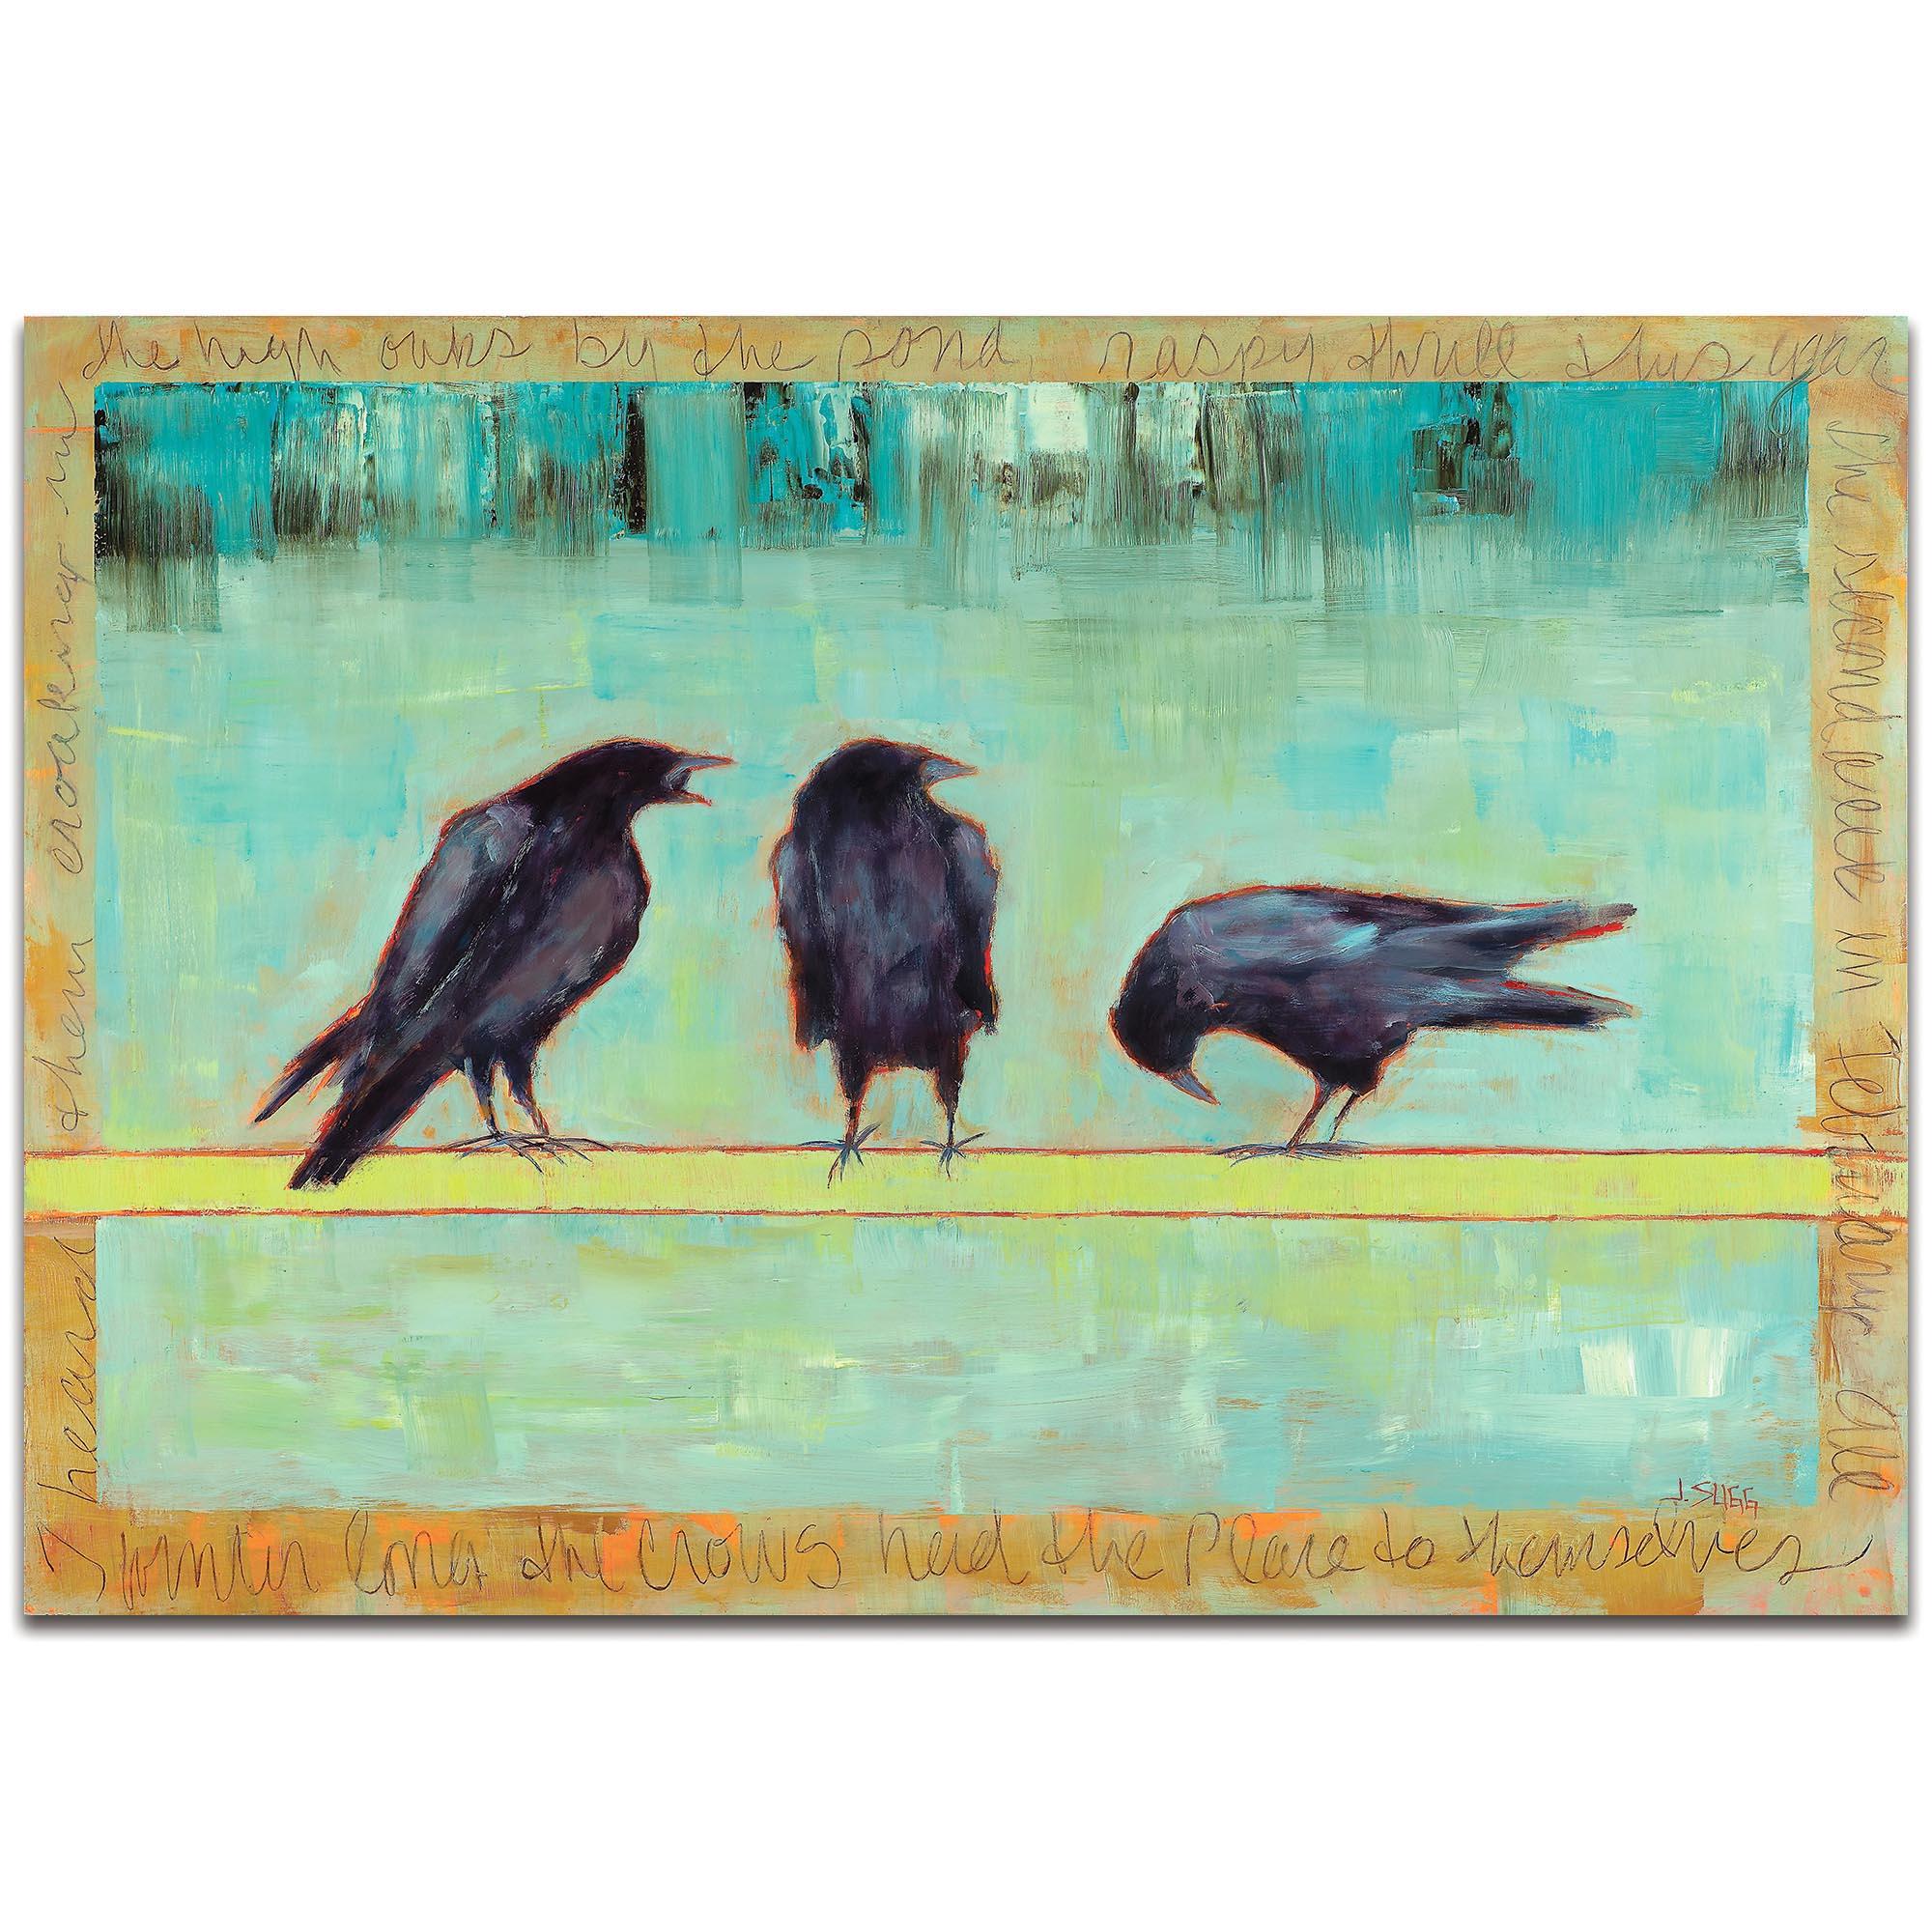 Contemporary Wall Art 'Crow Bar 1' - Urban Birds Decor on Metal or Plexiglass